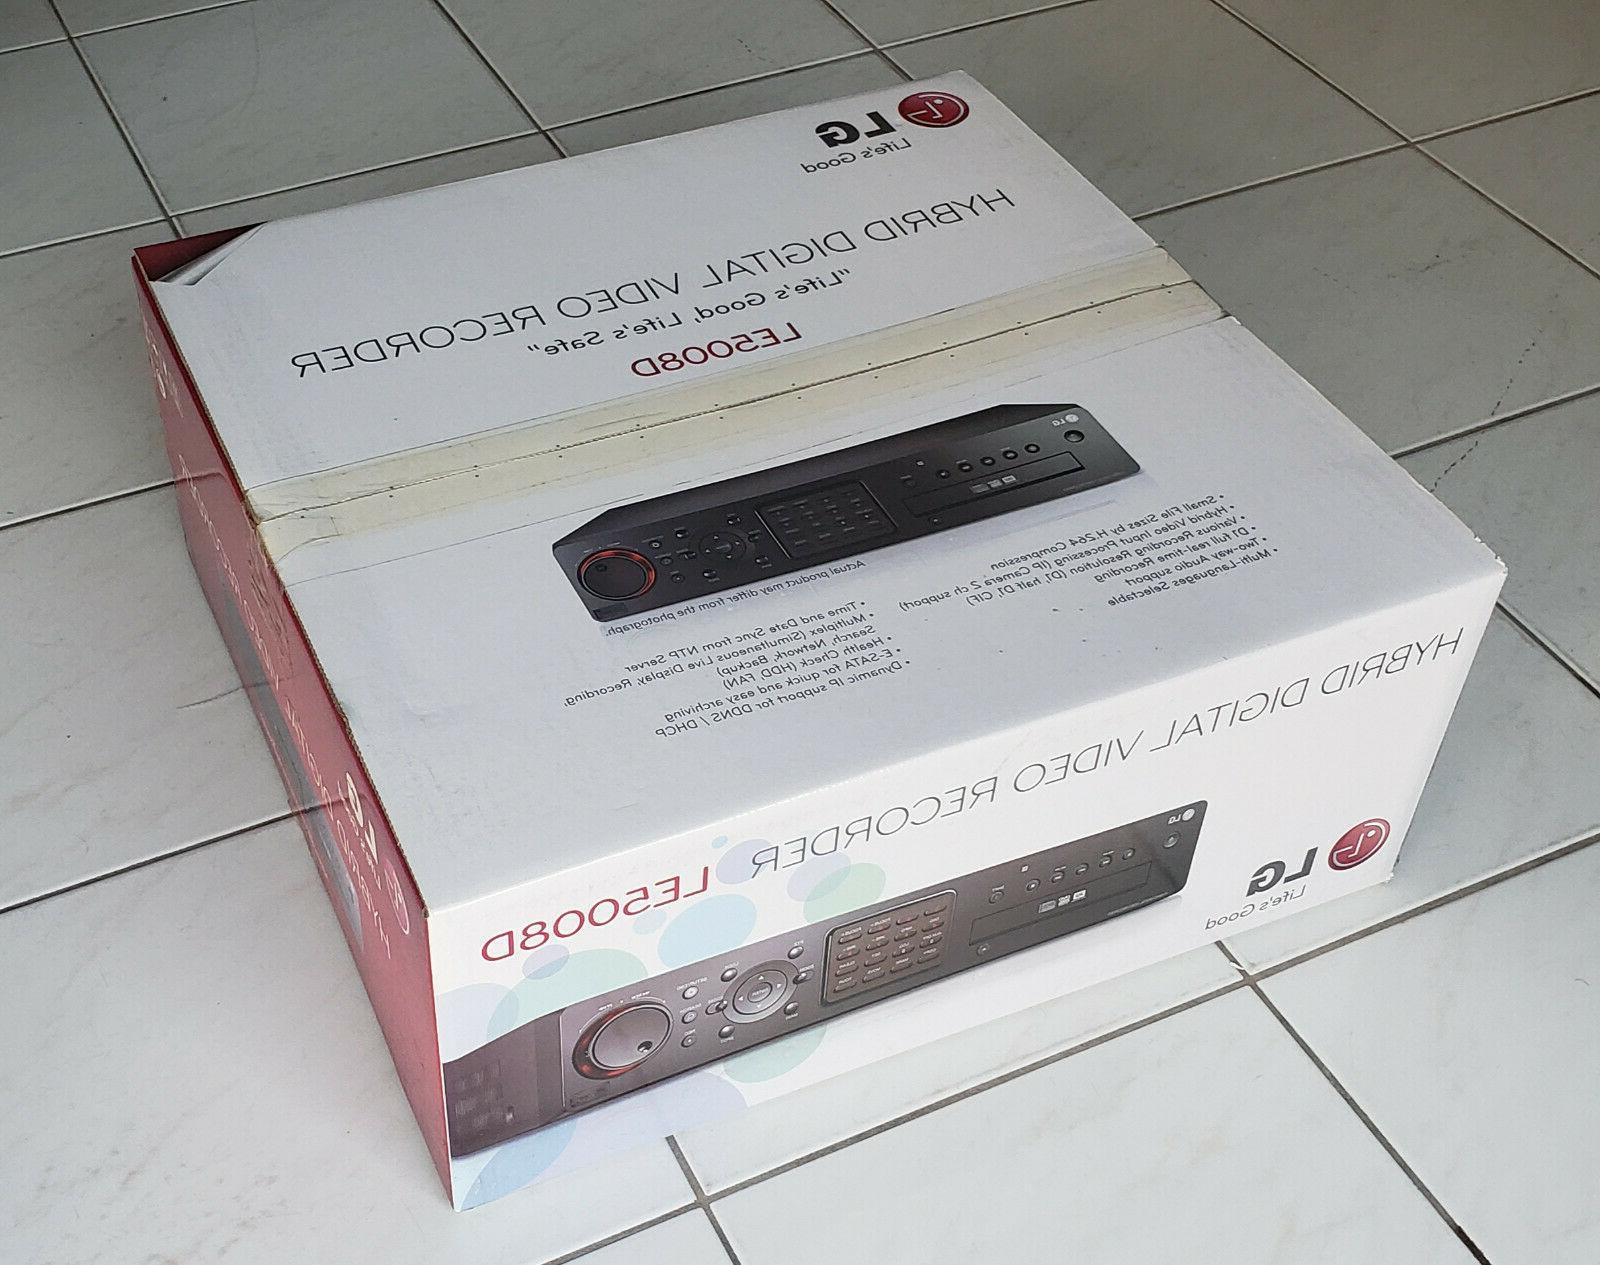 LG Digital Video Recorder DVR Security Hybrid